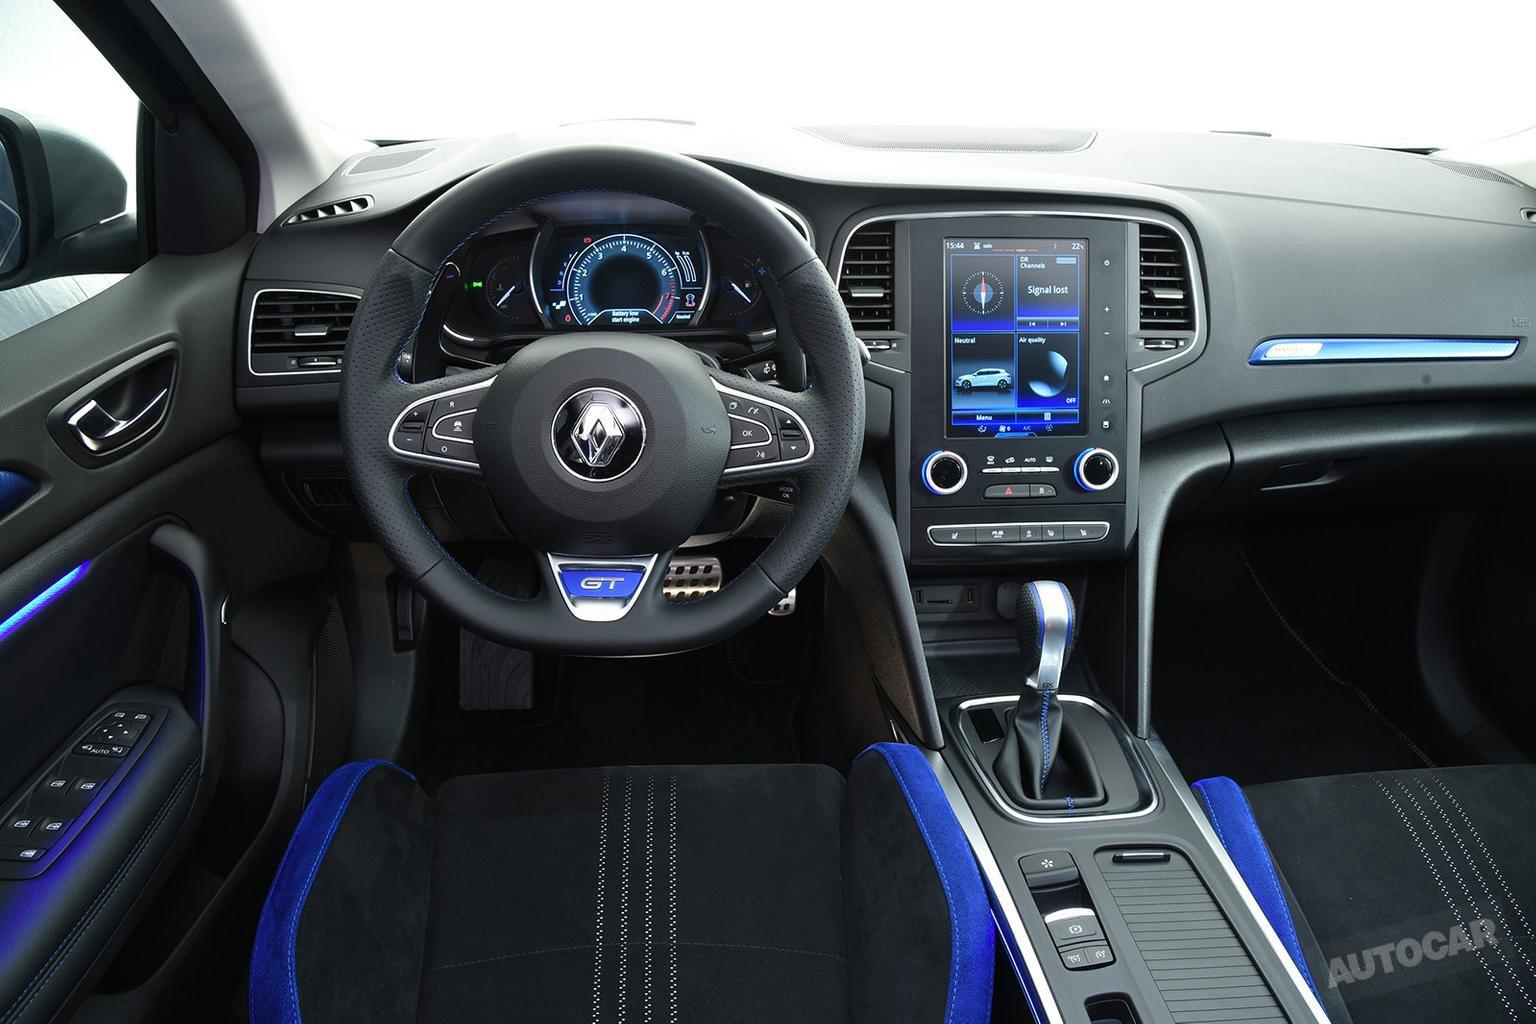 New Renault Megane on sale in July